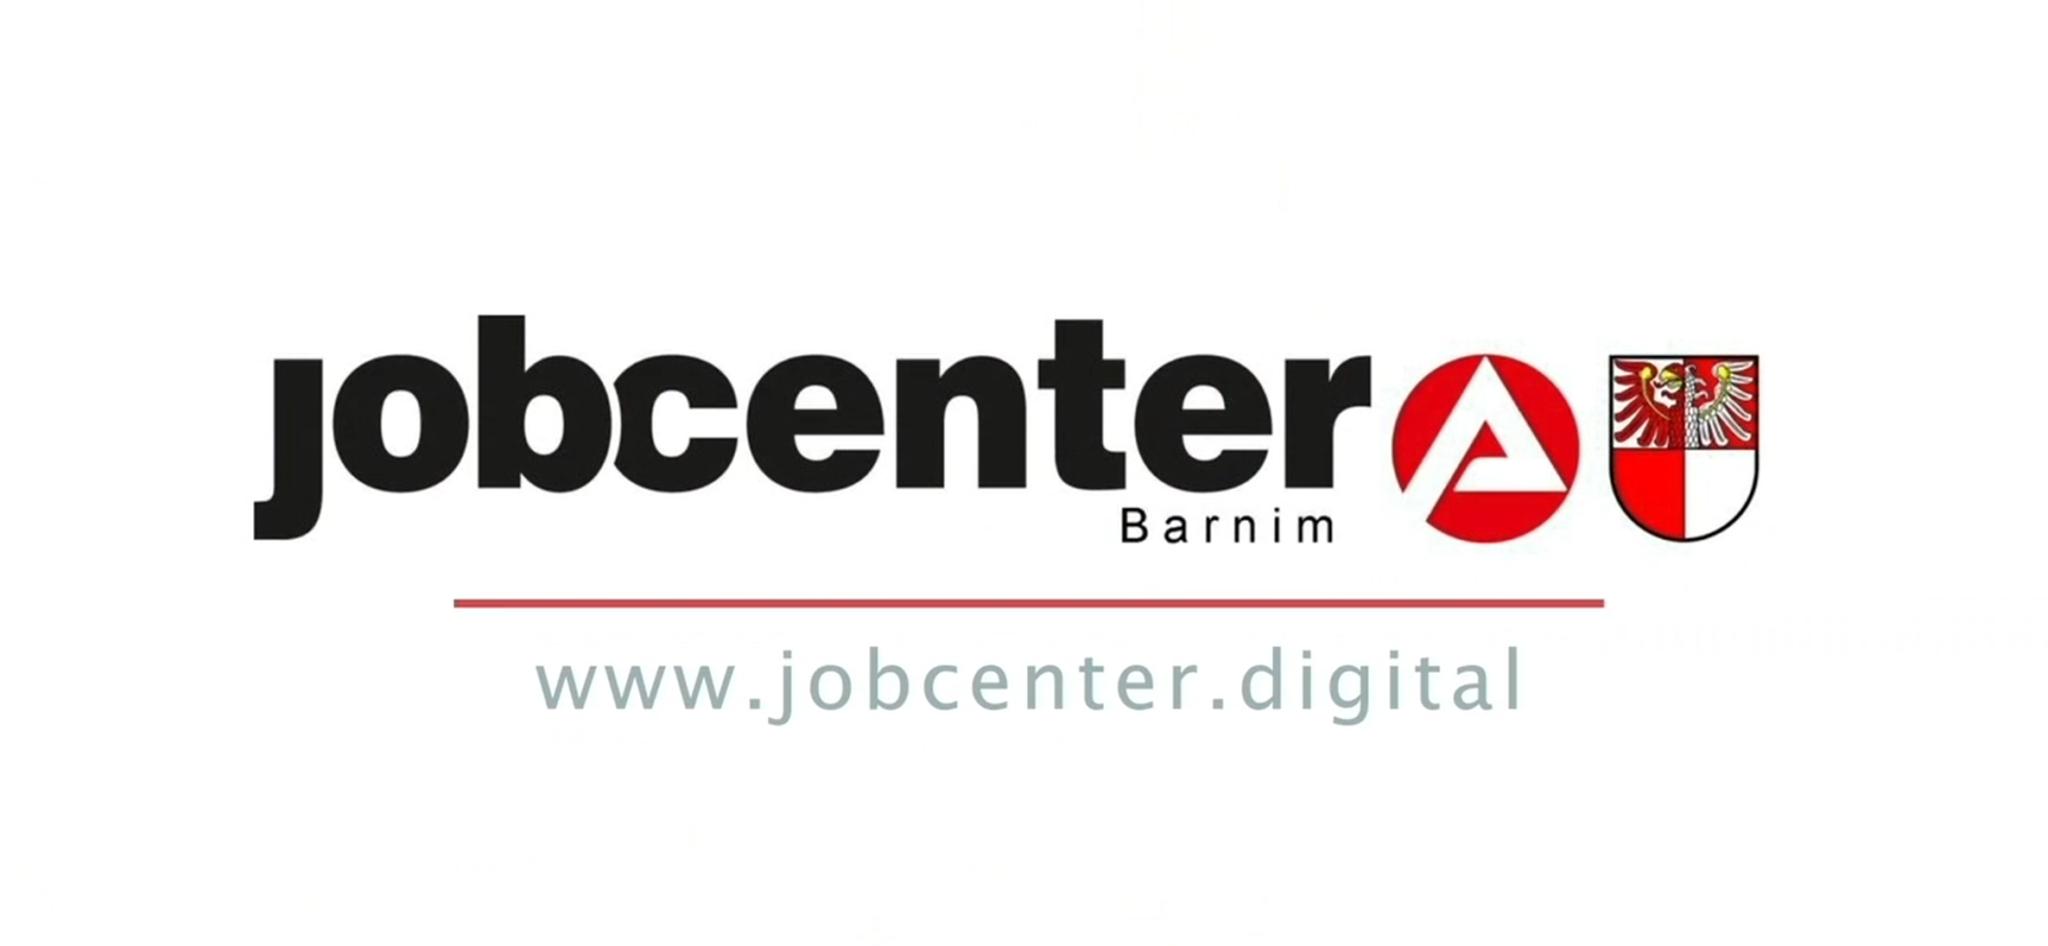 jobcenter eberswalde barnim arcity media